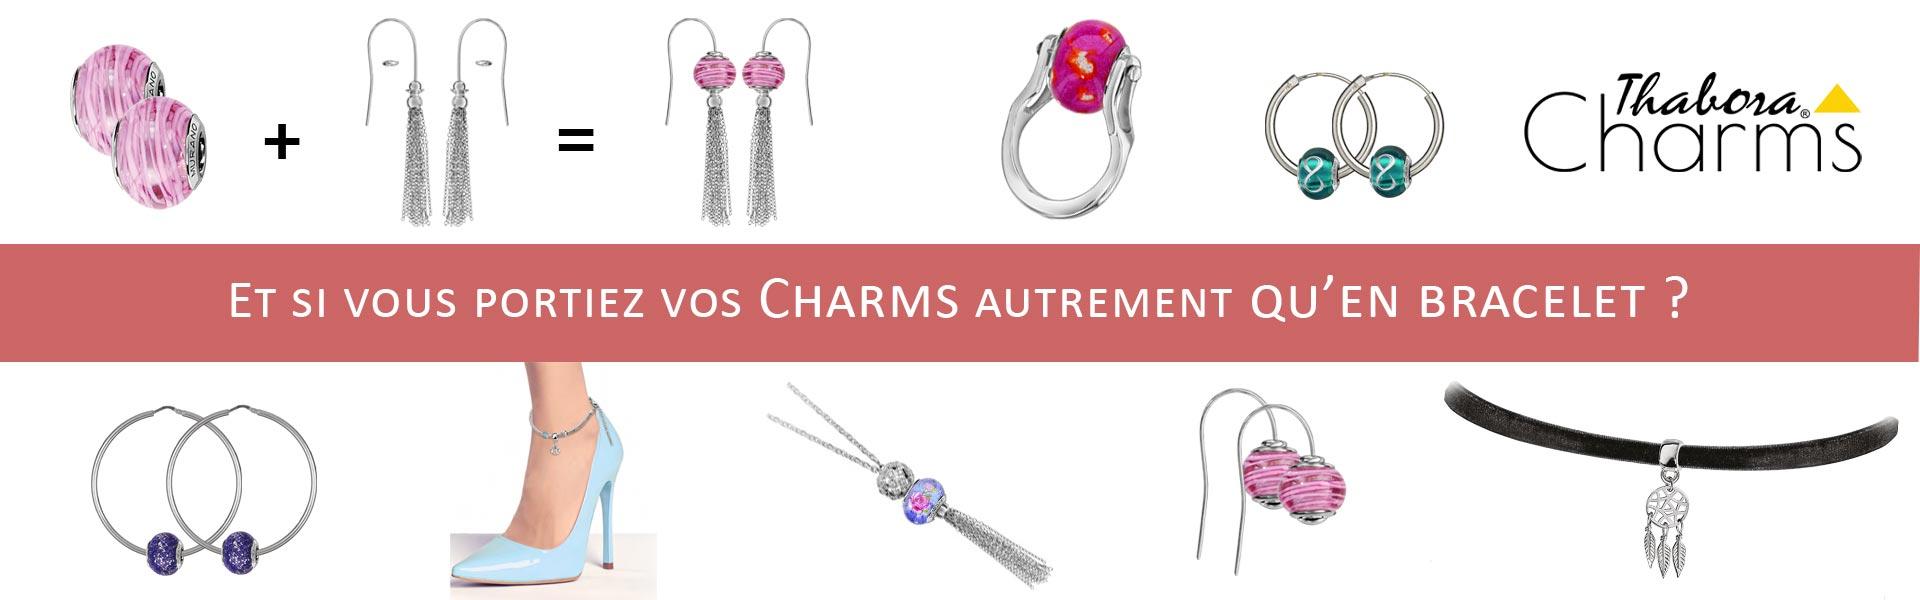 bijoux Thabora Charms